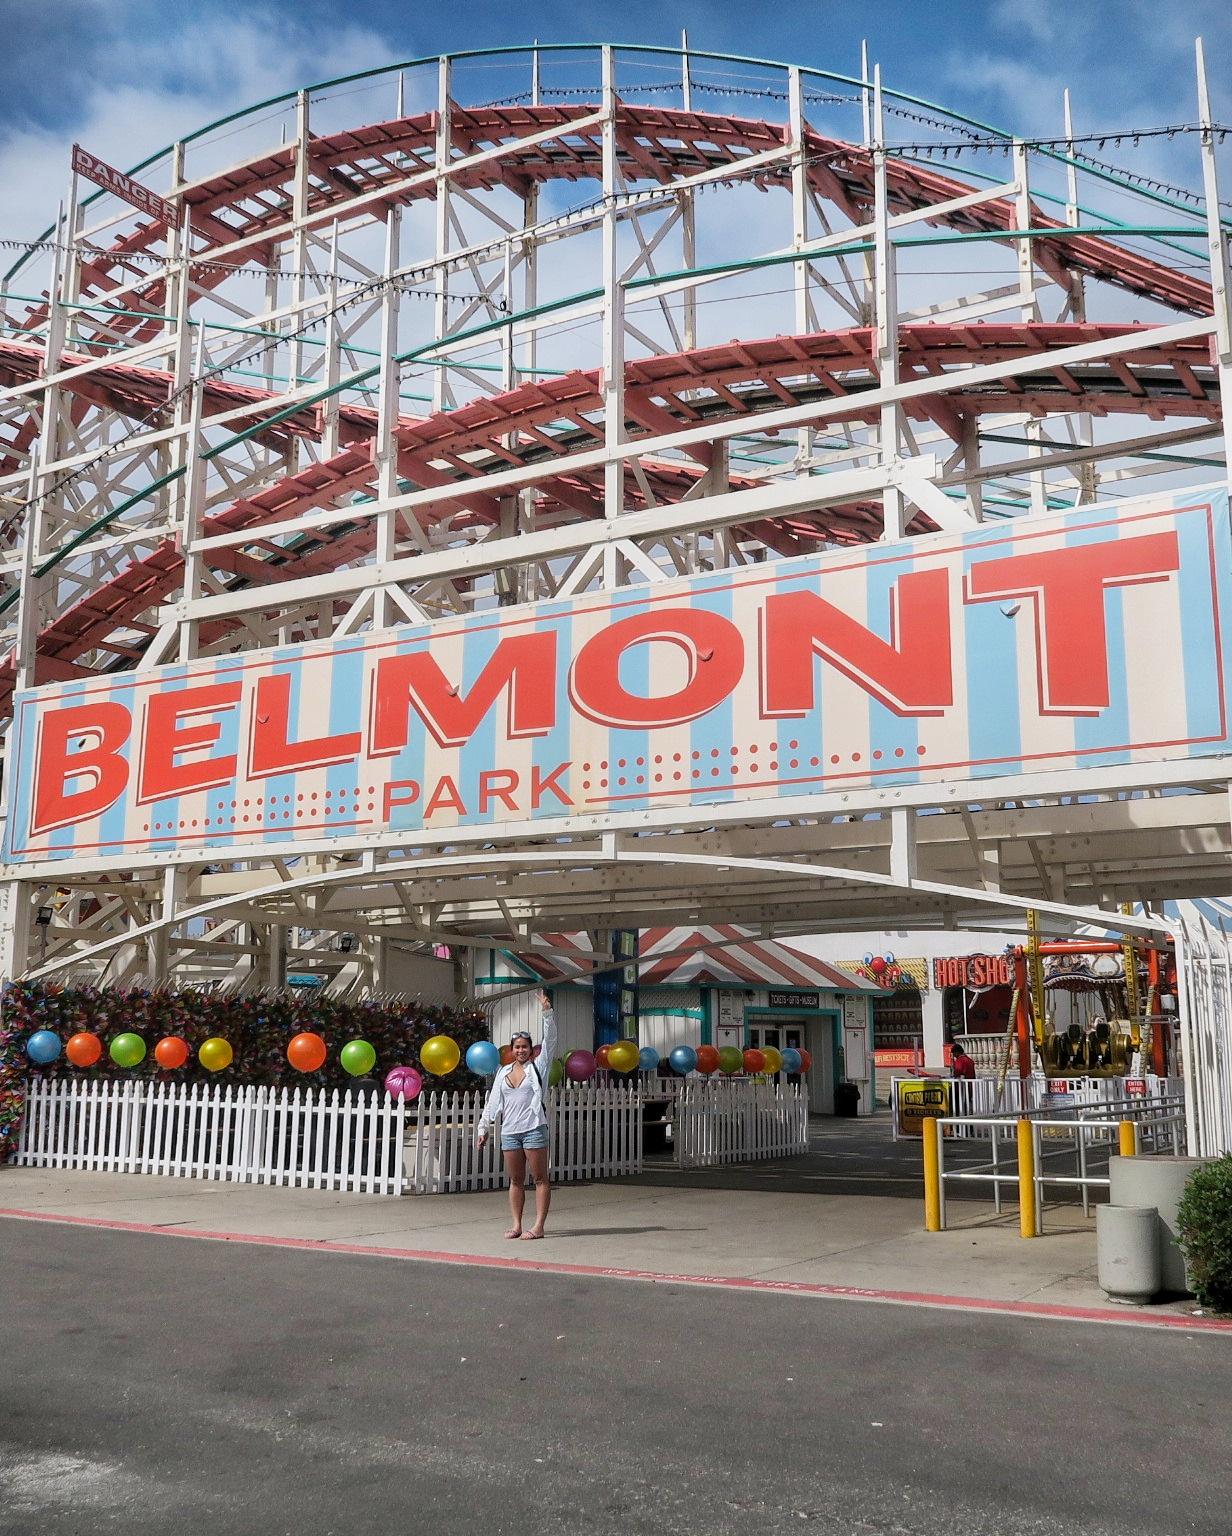 San Diego amusement park roller coaster